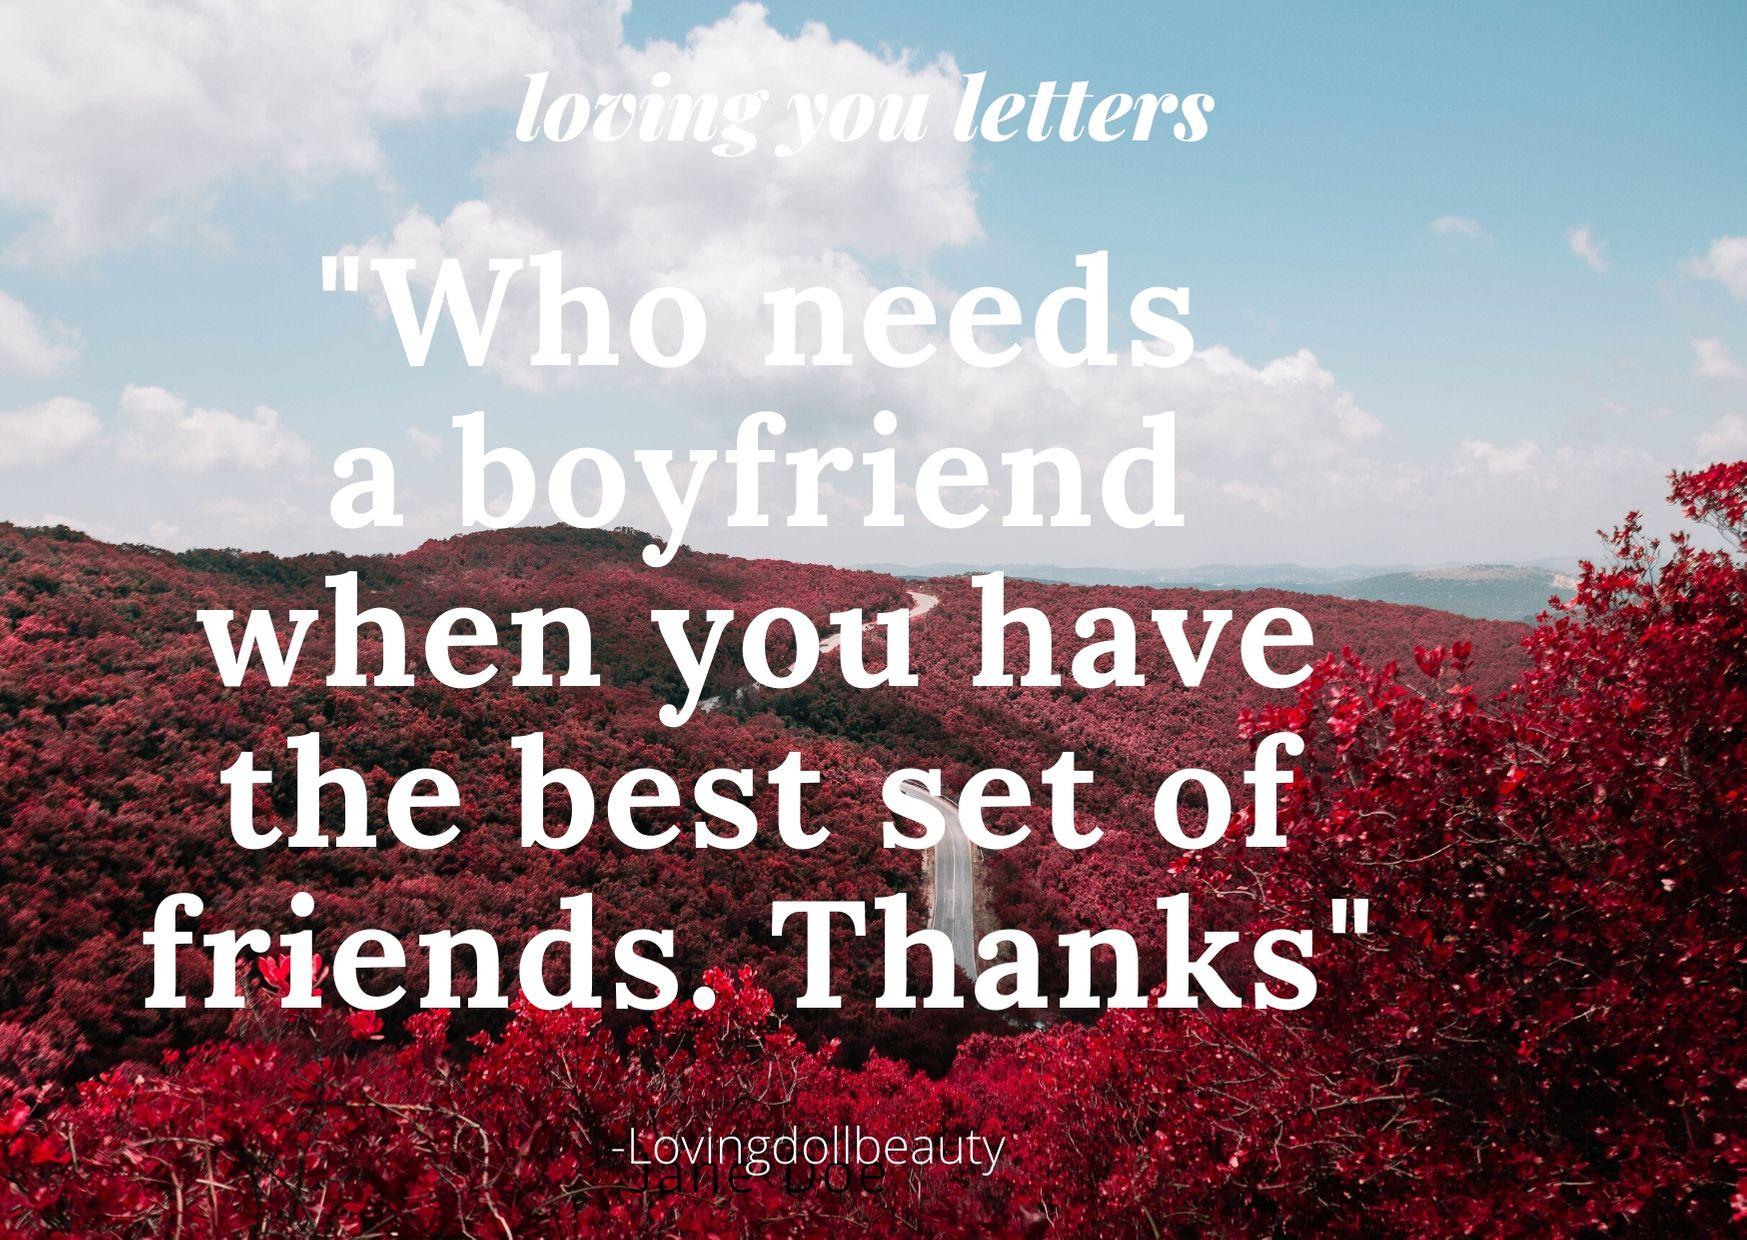 loving-you-letter